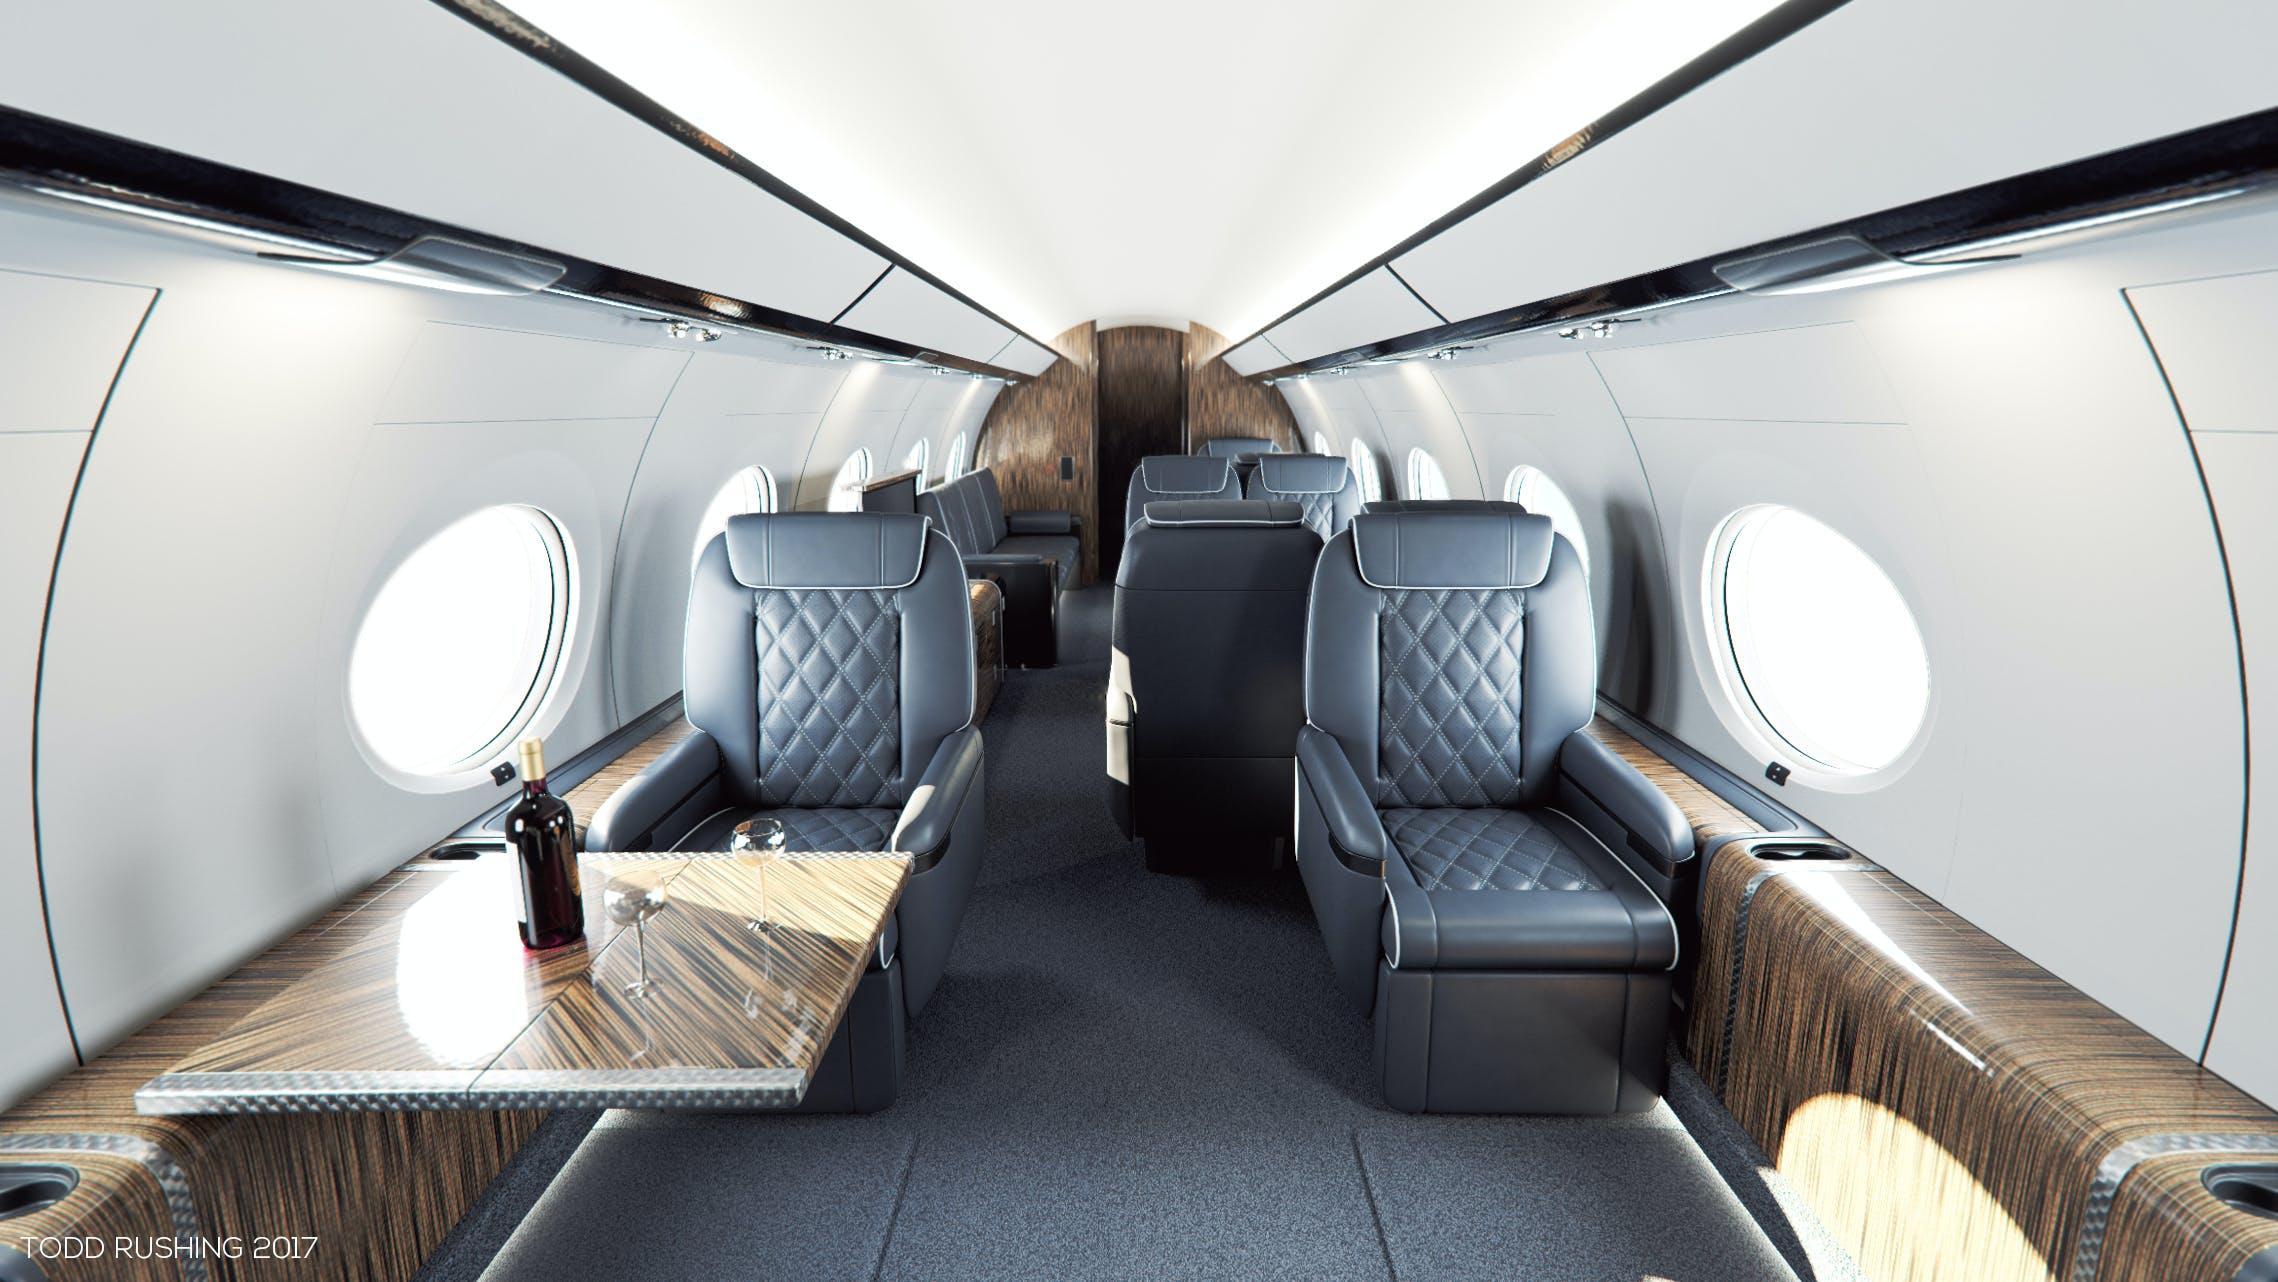 gulfstream g650 interior photos. Black Bedroom Furniture Sets. Home Design Ideas